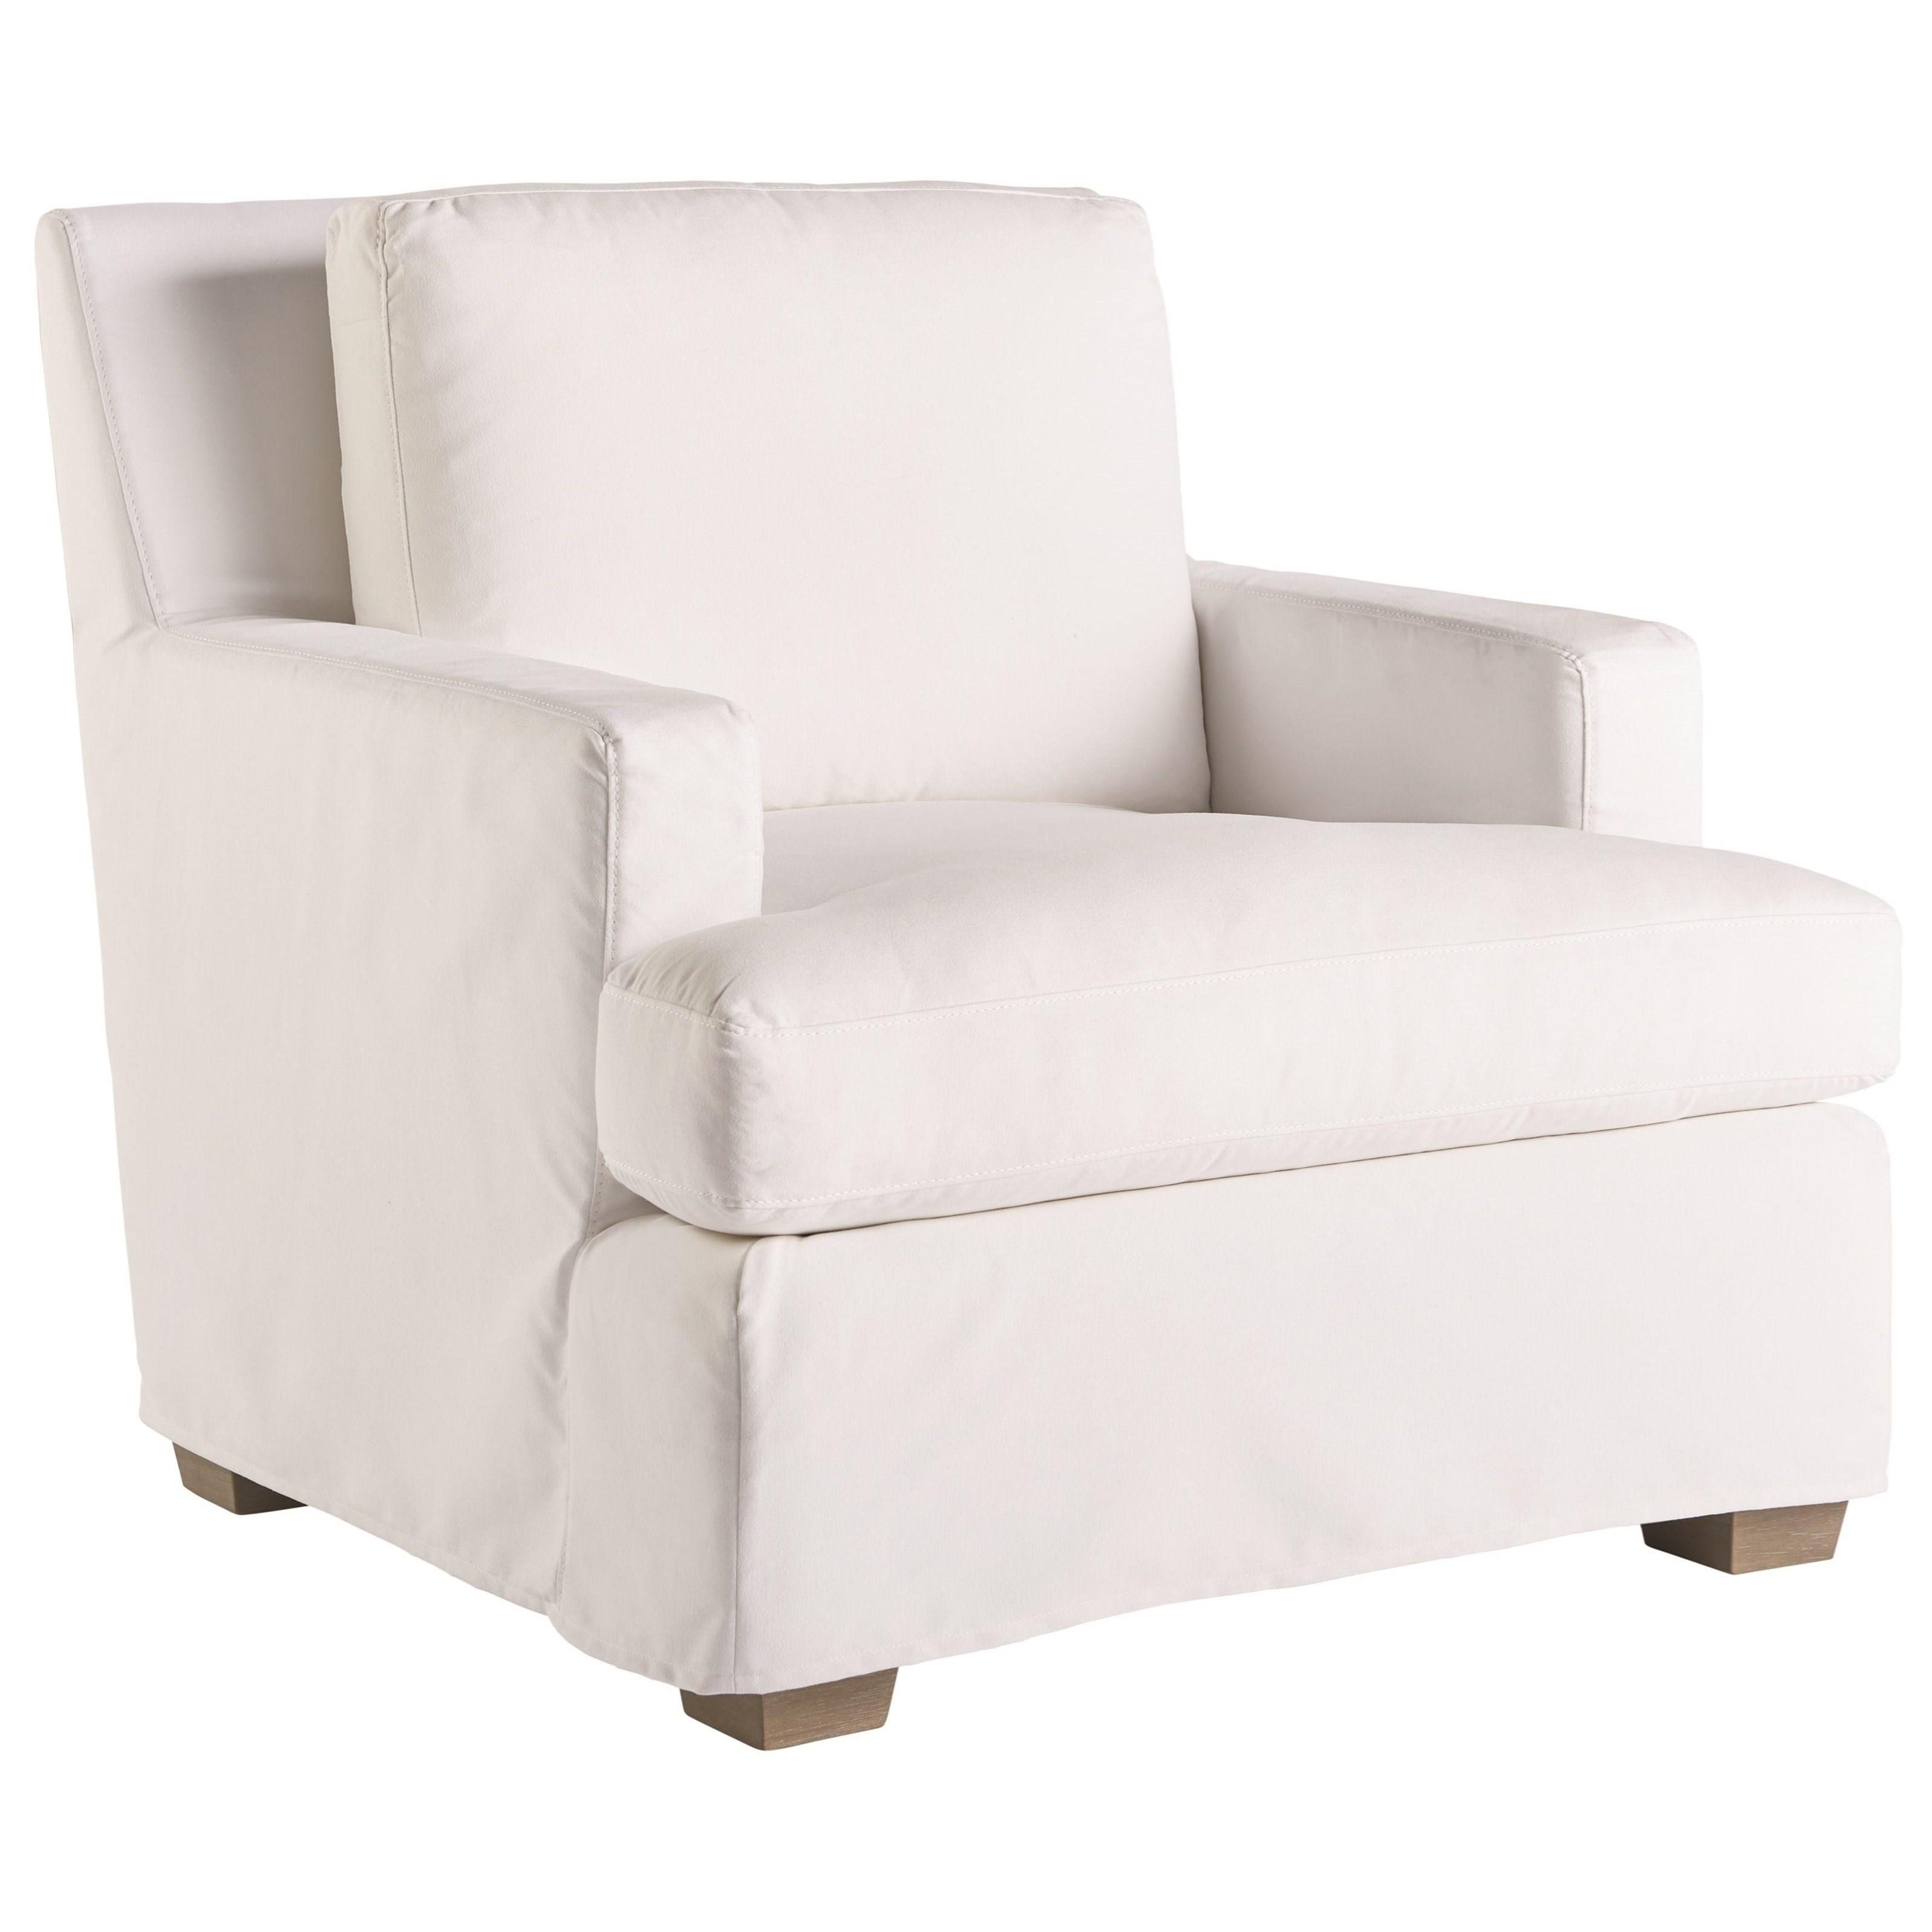 Love. Joy. Bliss.-Miranda Kerr Home Malibu Slipcover Chair by Universal at Baer's Furniture